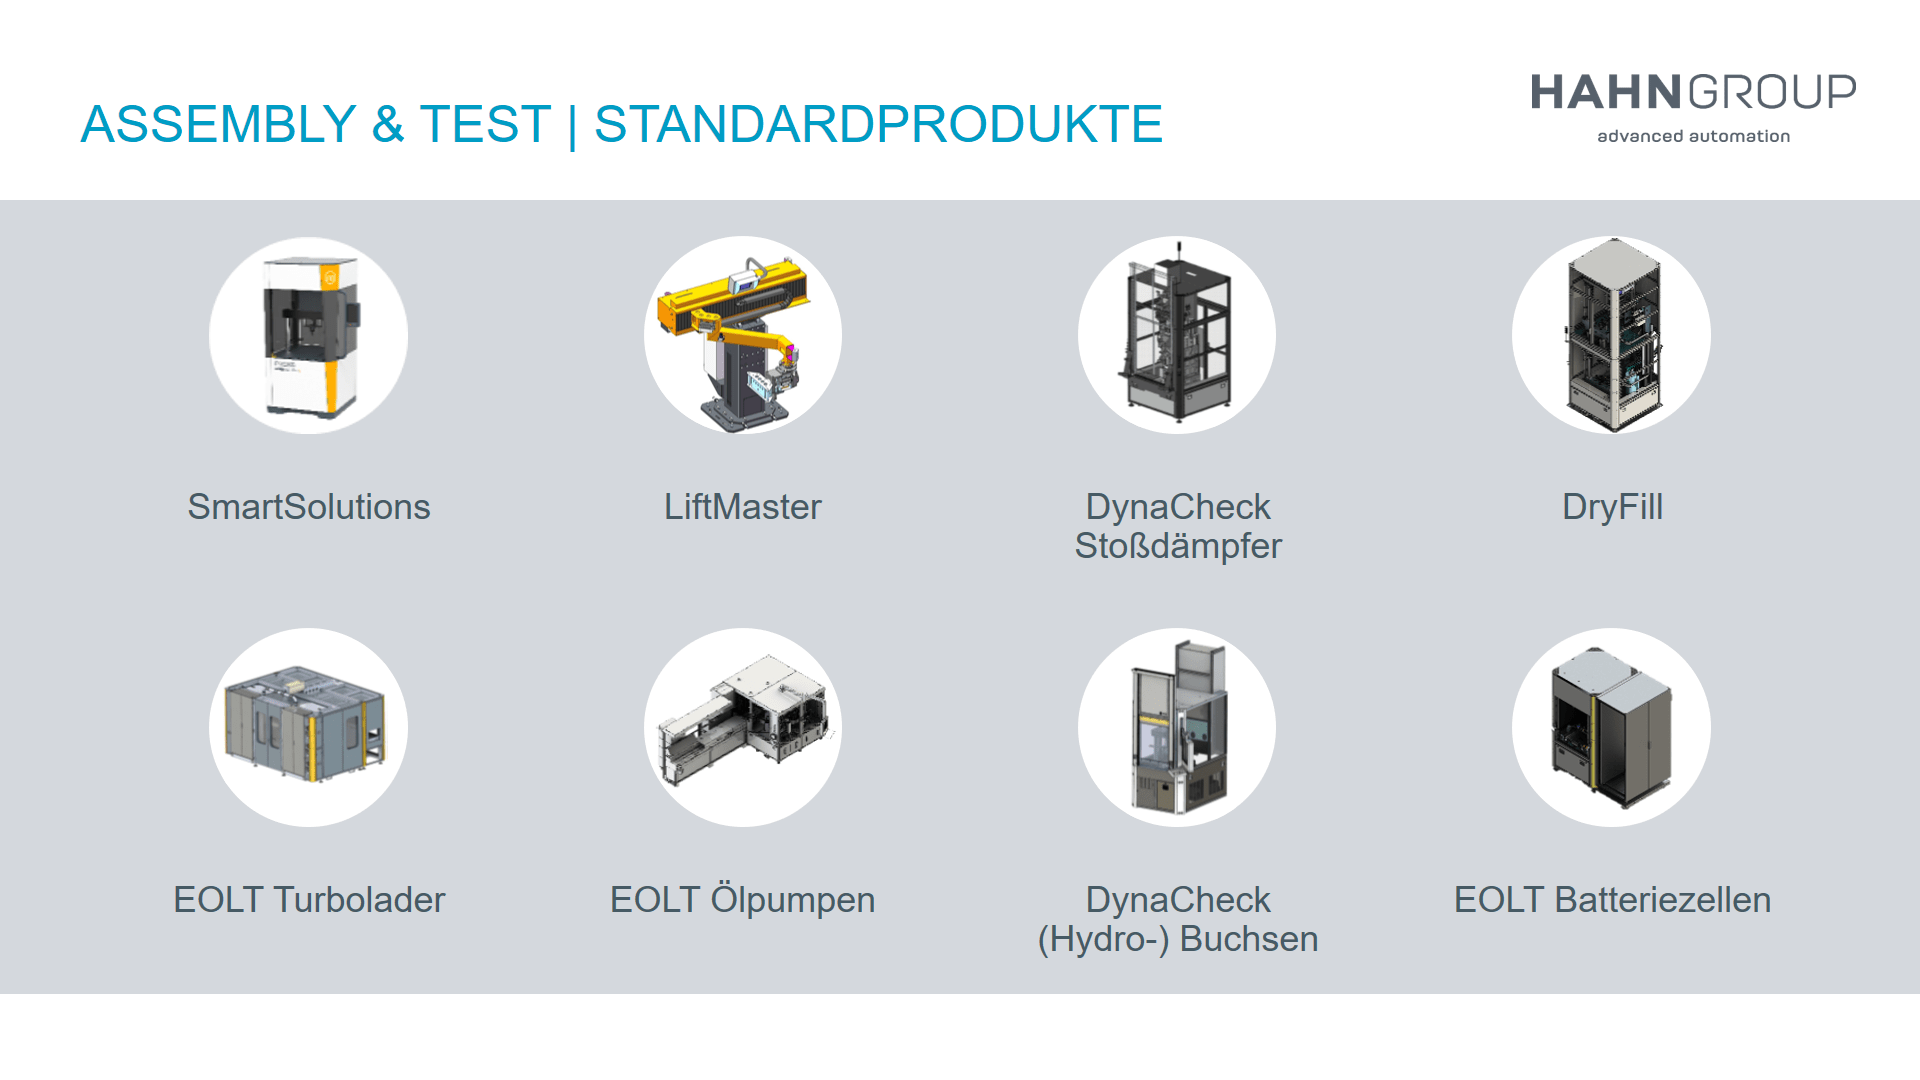 HG_Standardprodukte_Assembly and Test